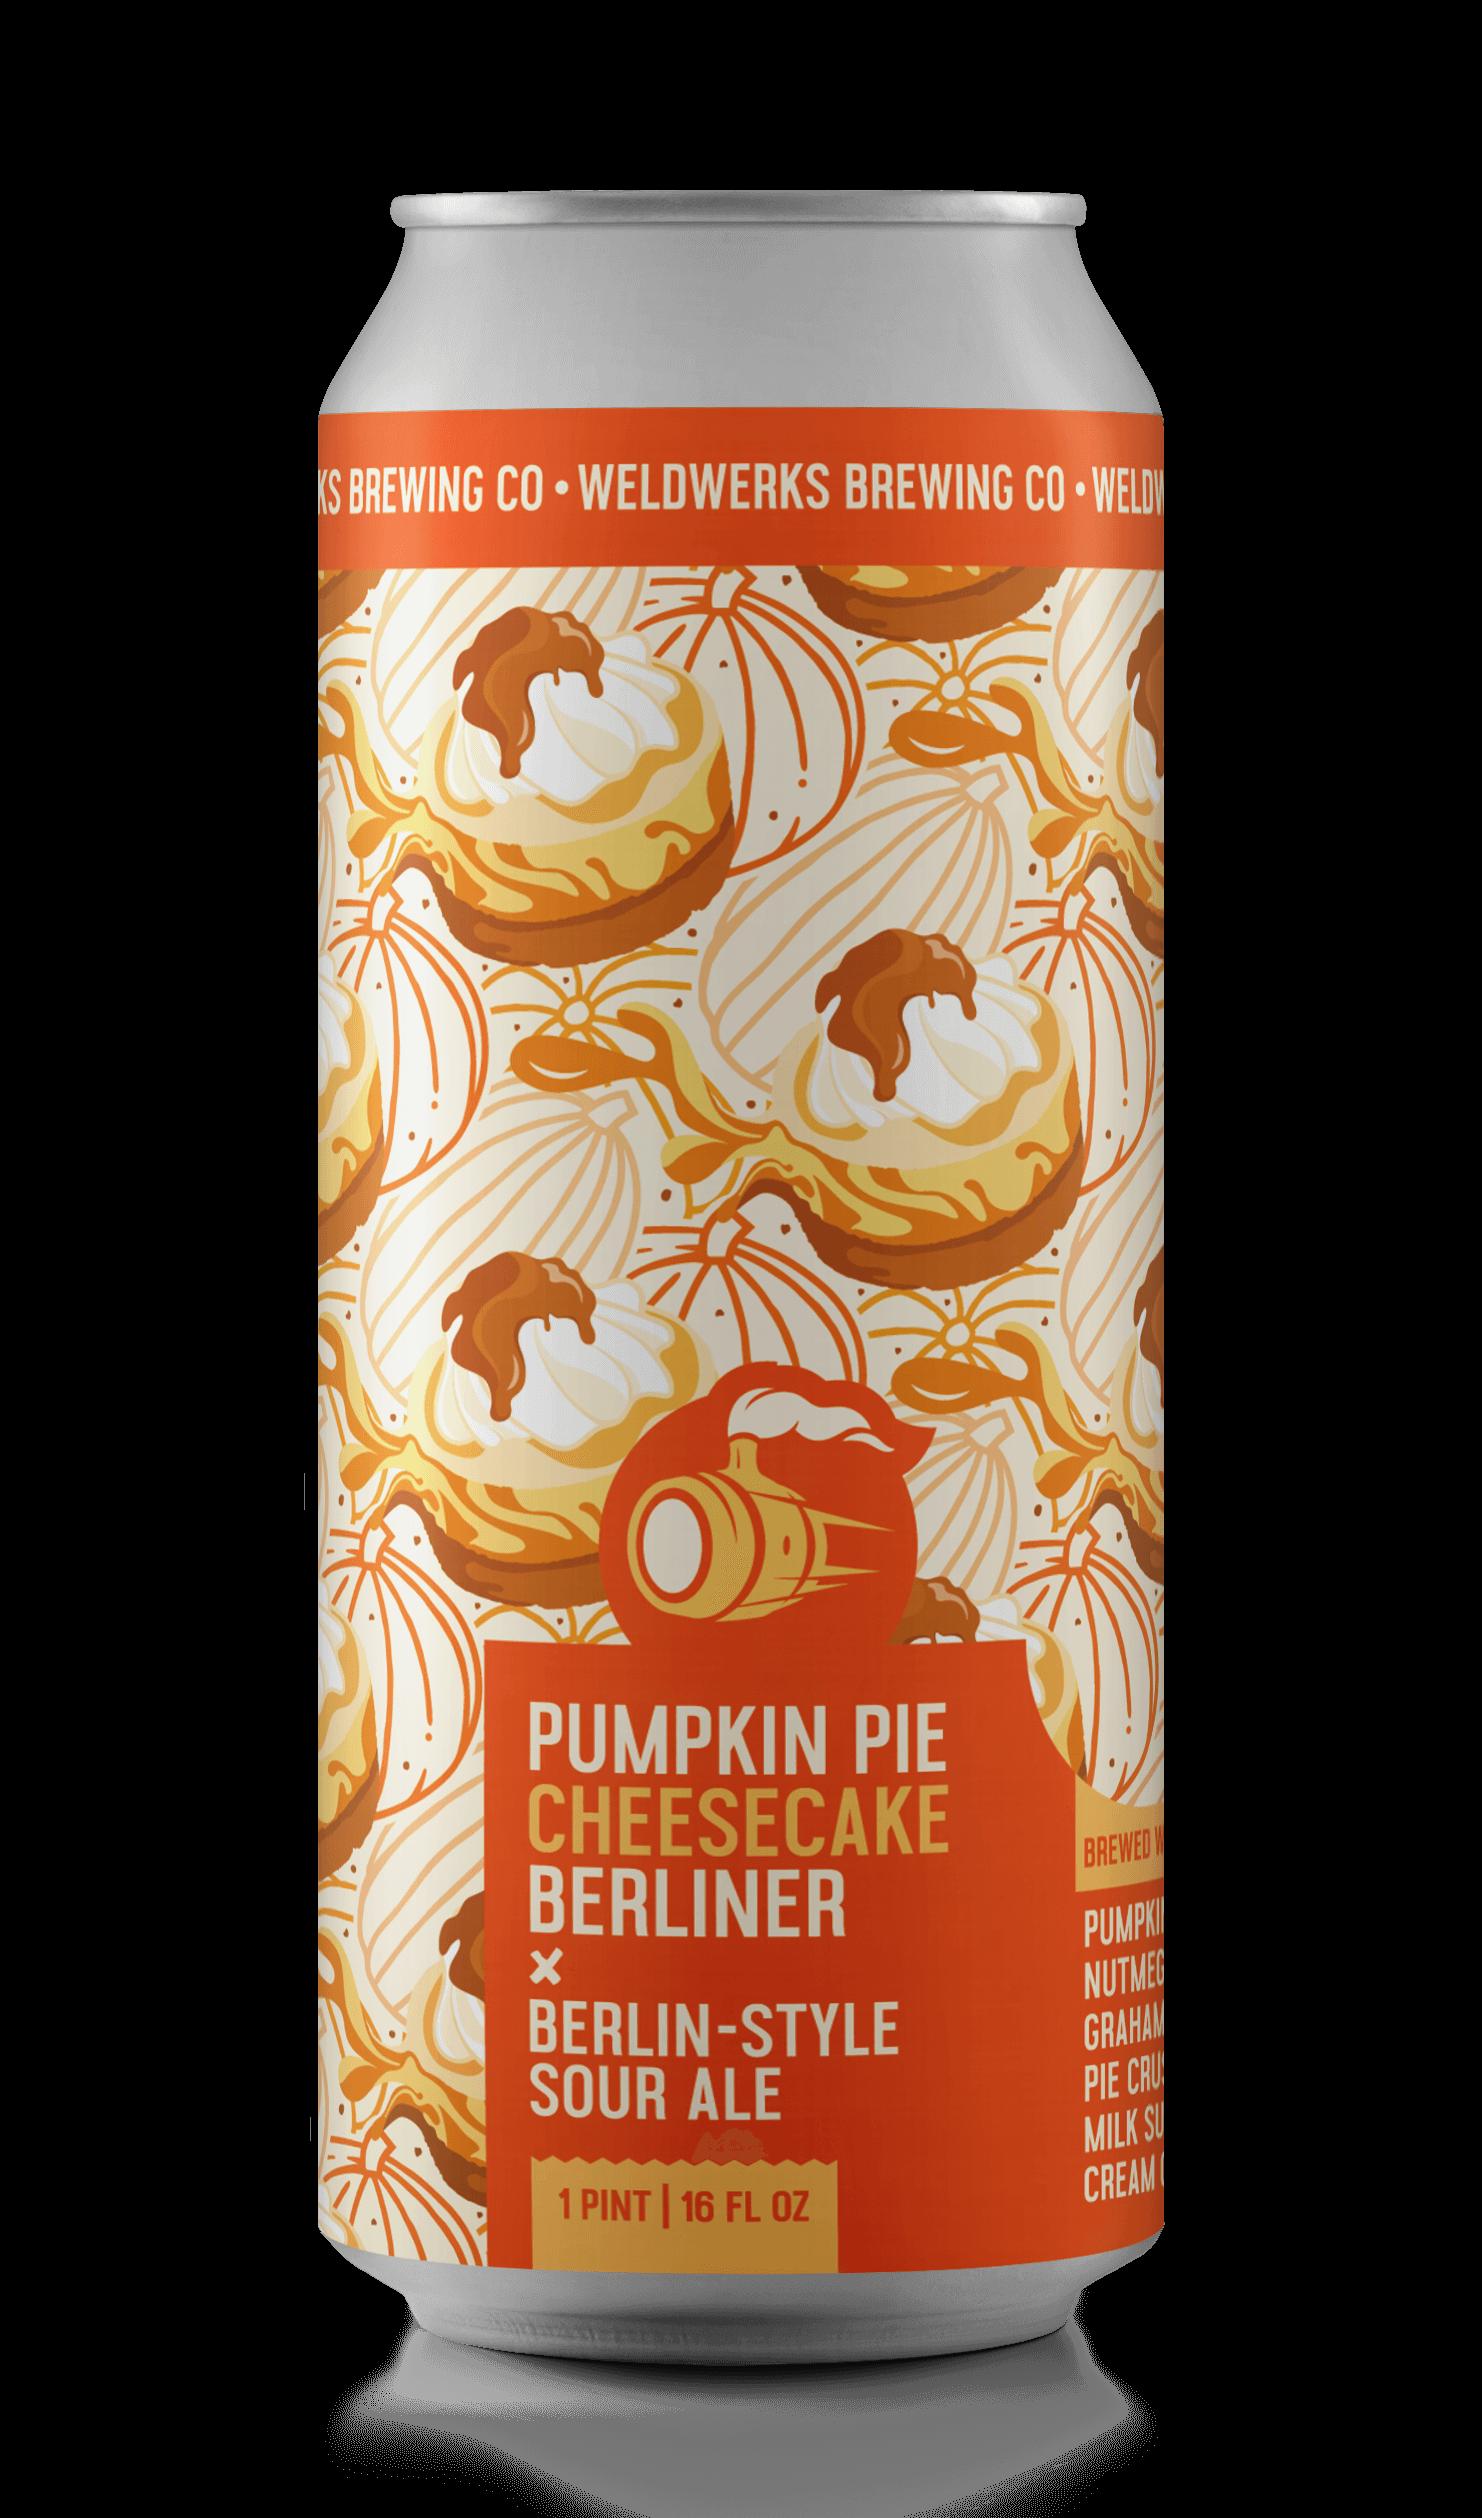 Pumpkin Pie Cheesecake Berliner